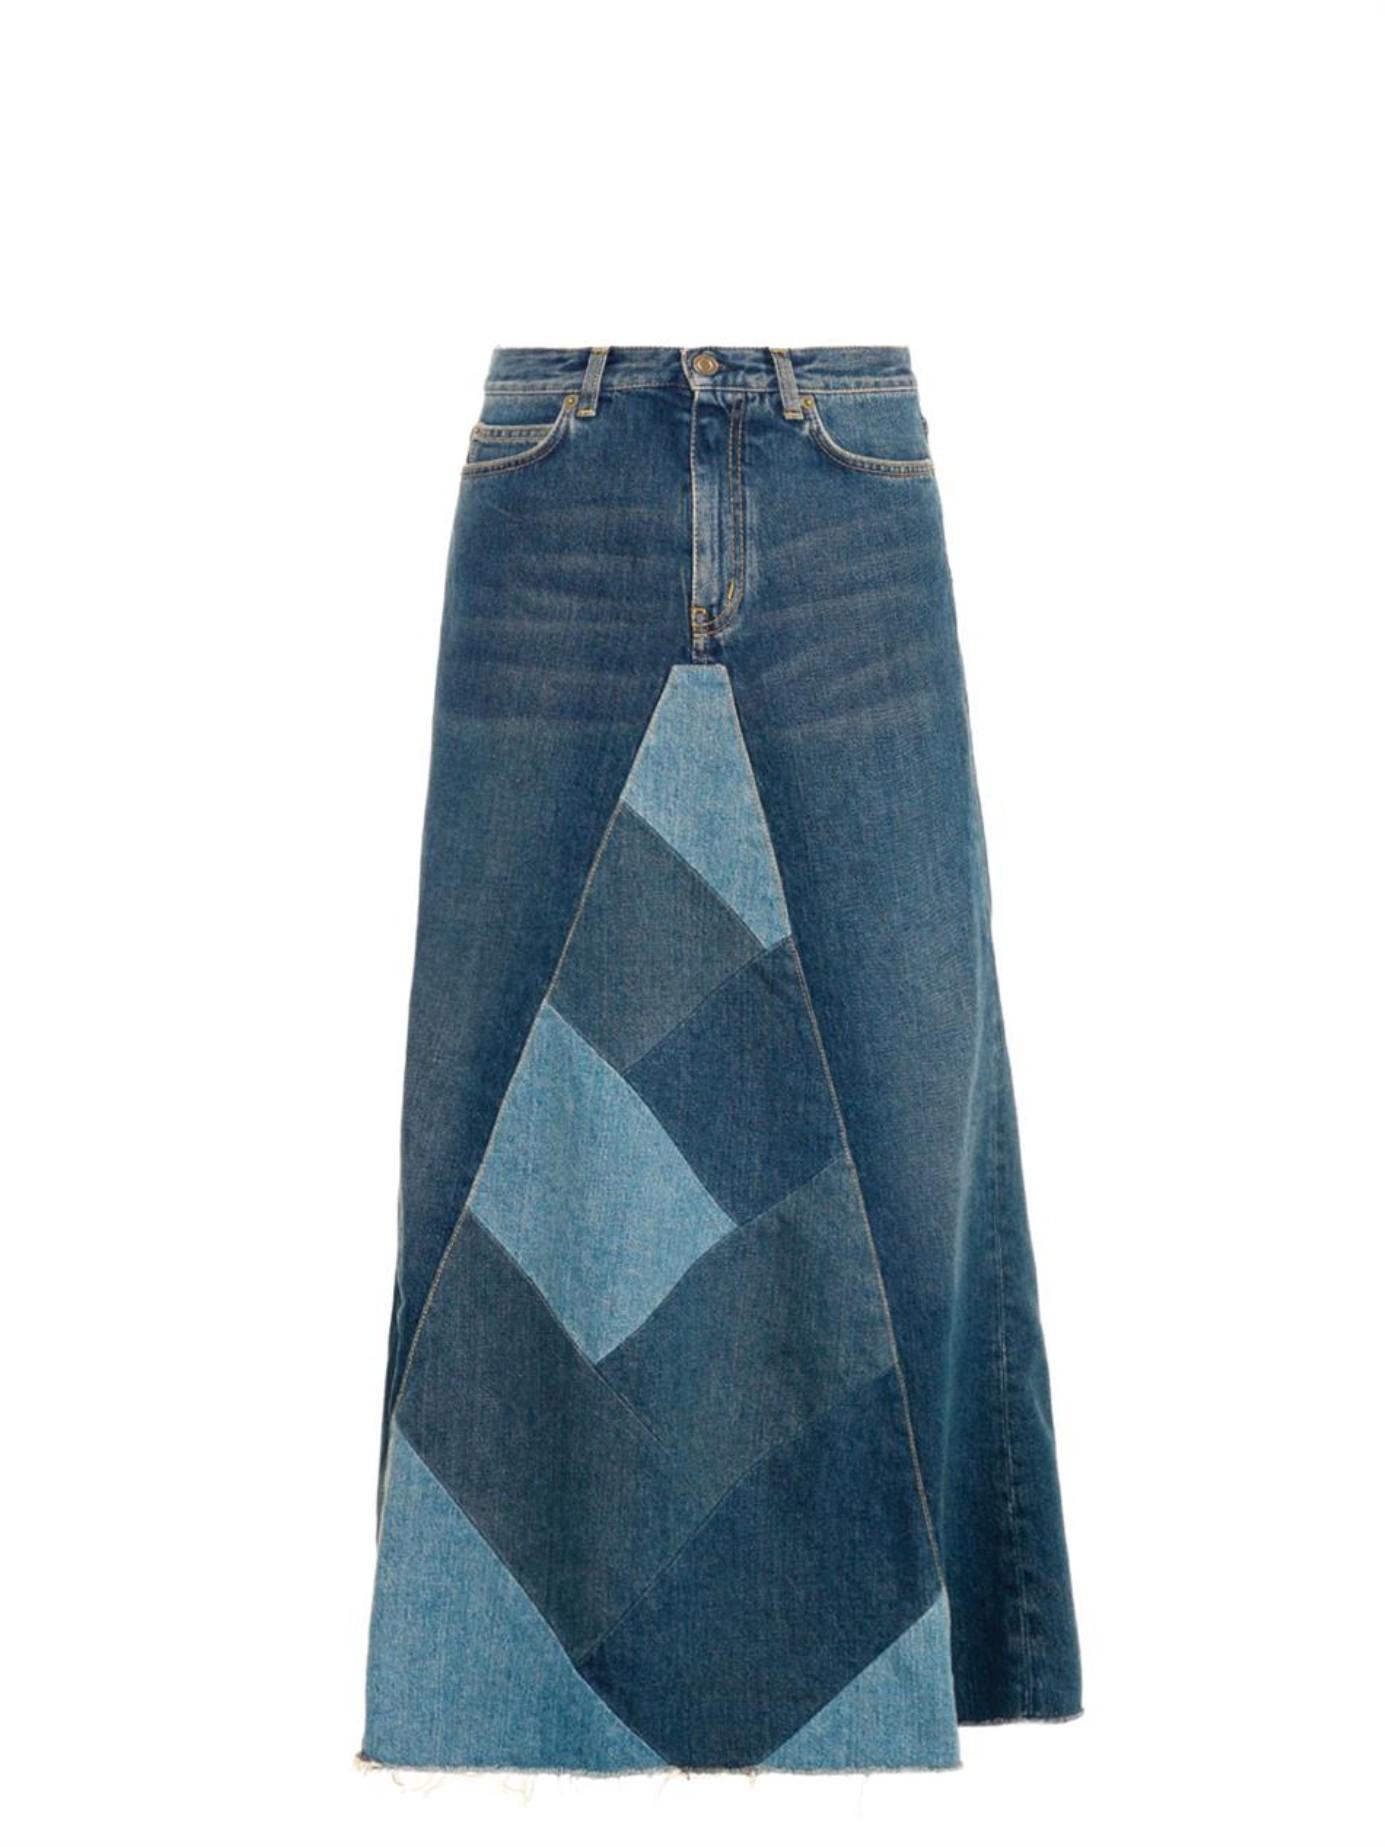 Saint laurent Patchwork Denim Maxi Skirt in Blue | Lyst